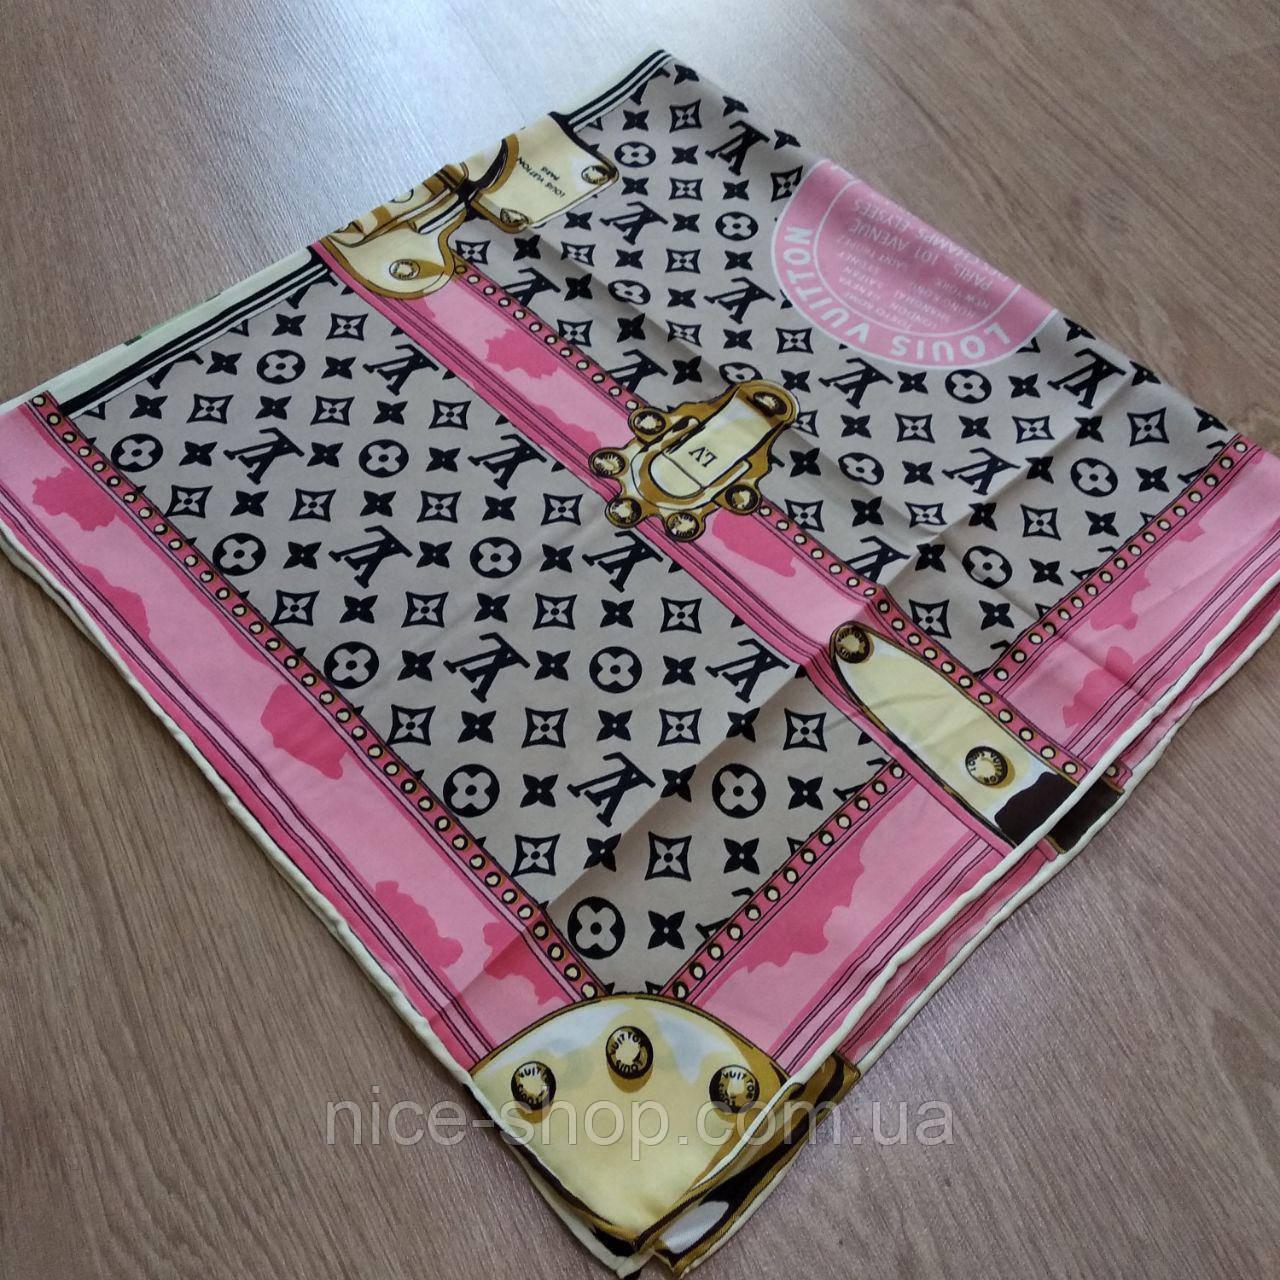 Платок Louis Vuitton шелк бежевый с принтом